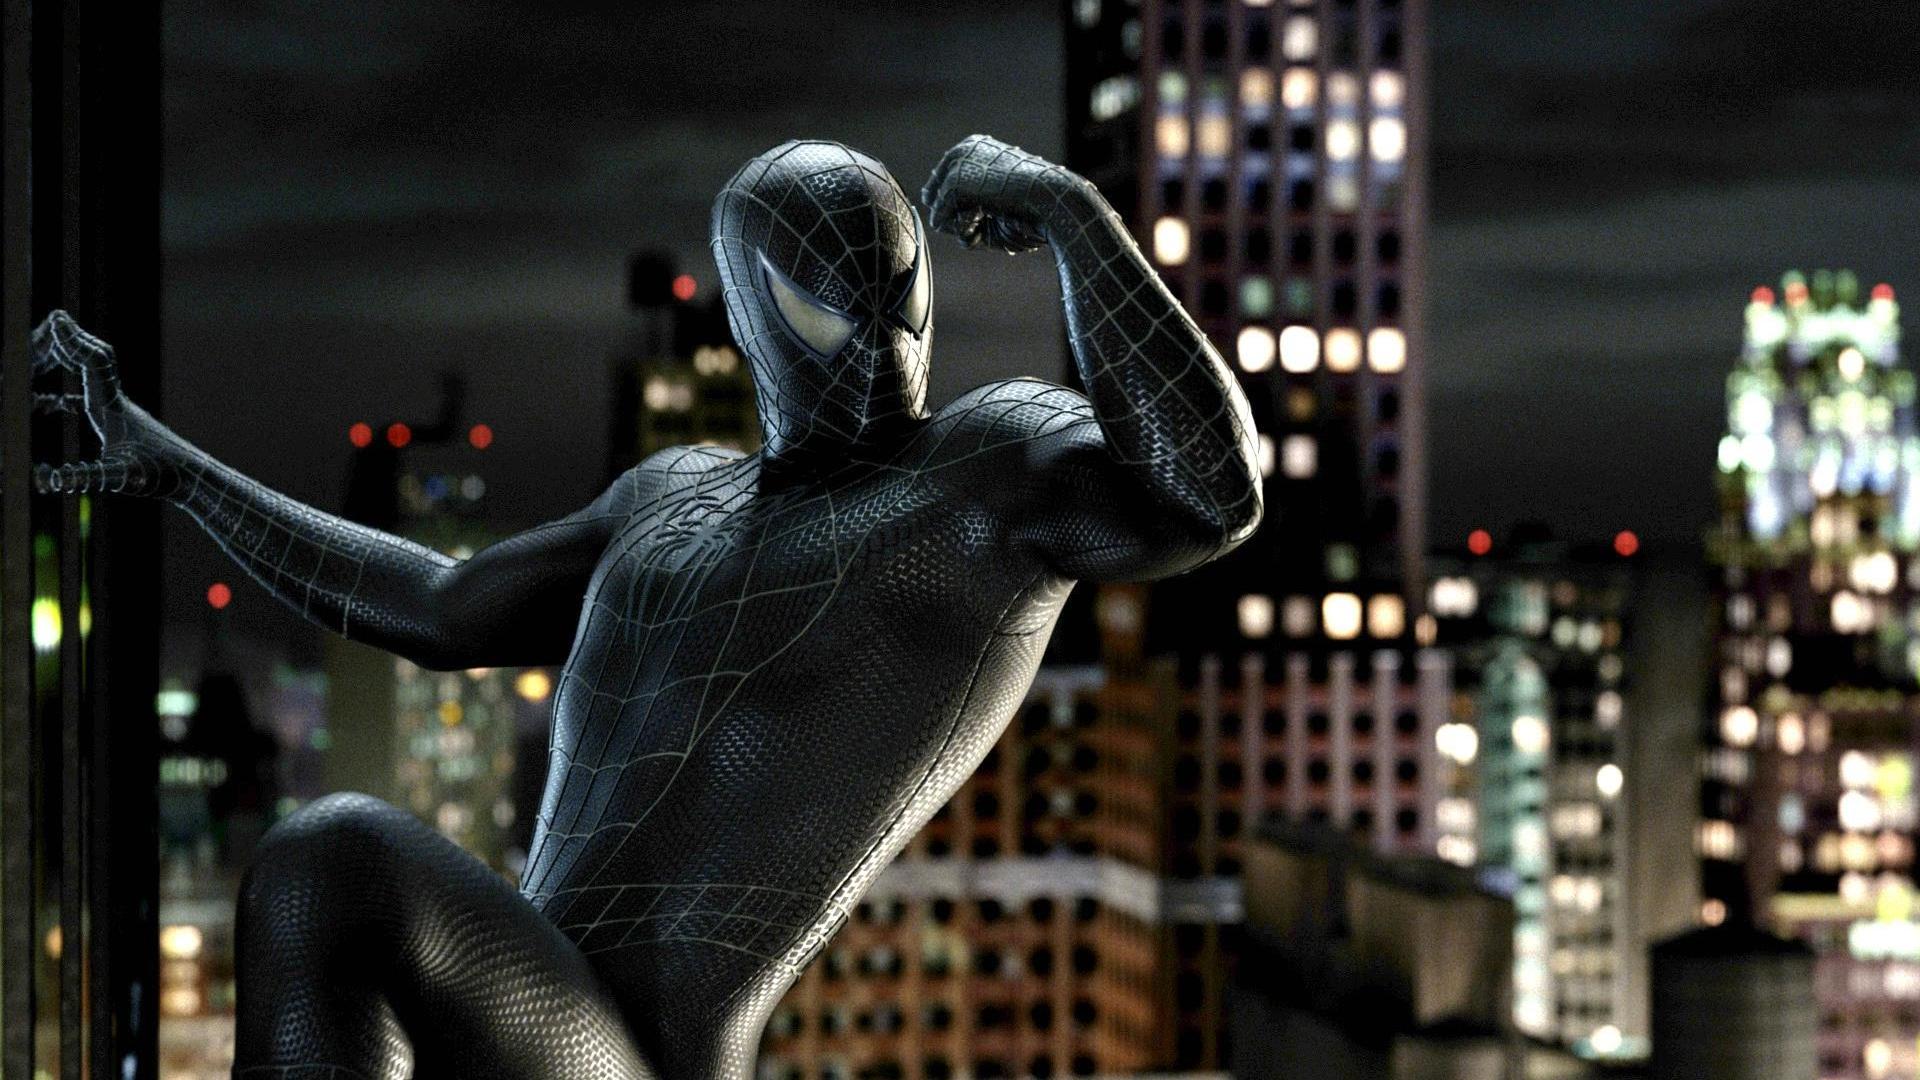 spiderman steven crowder takes - HD1920×1080